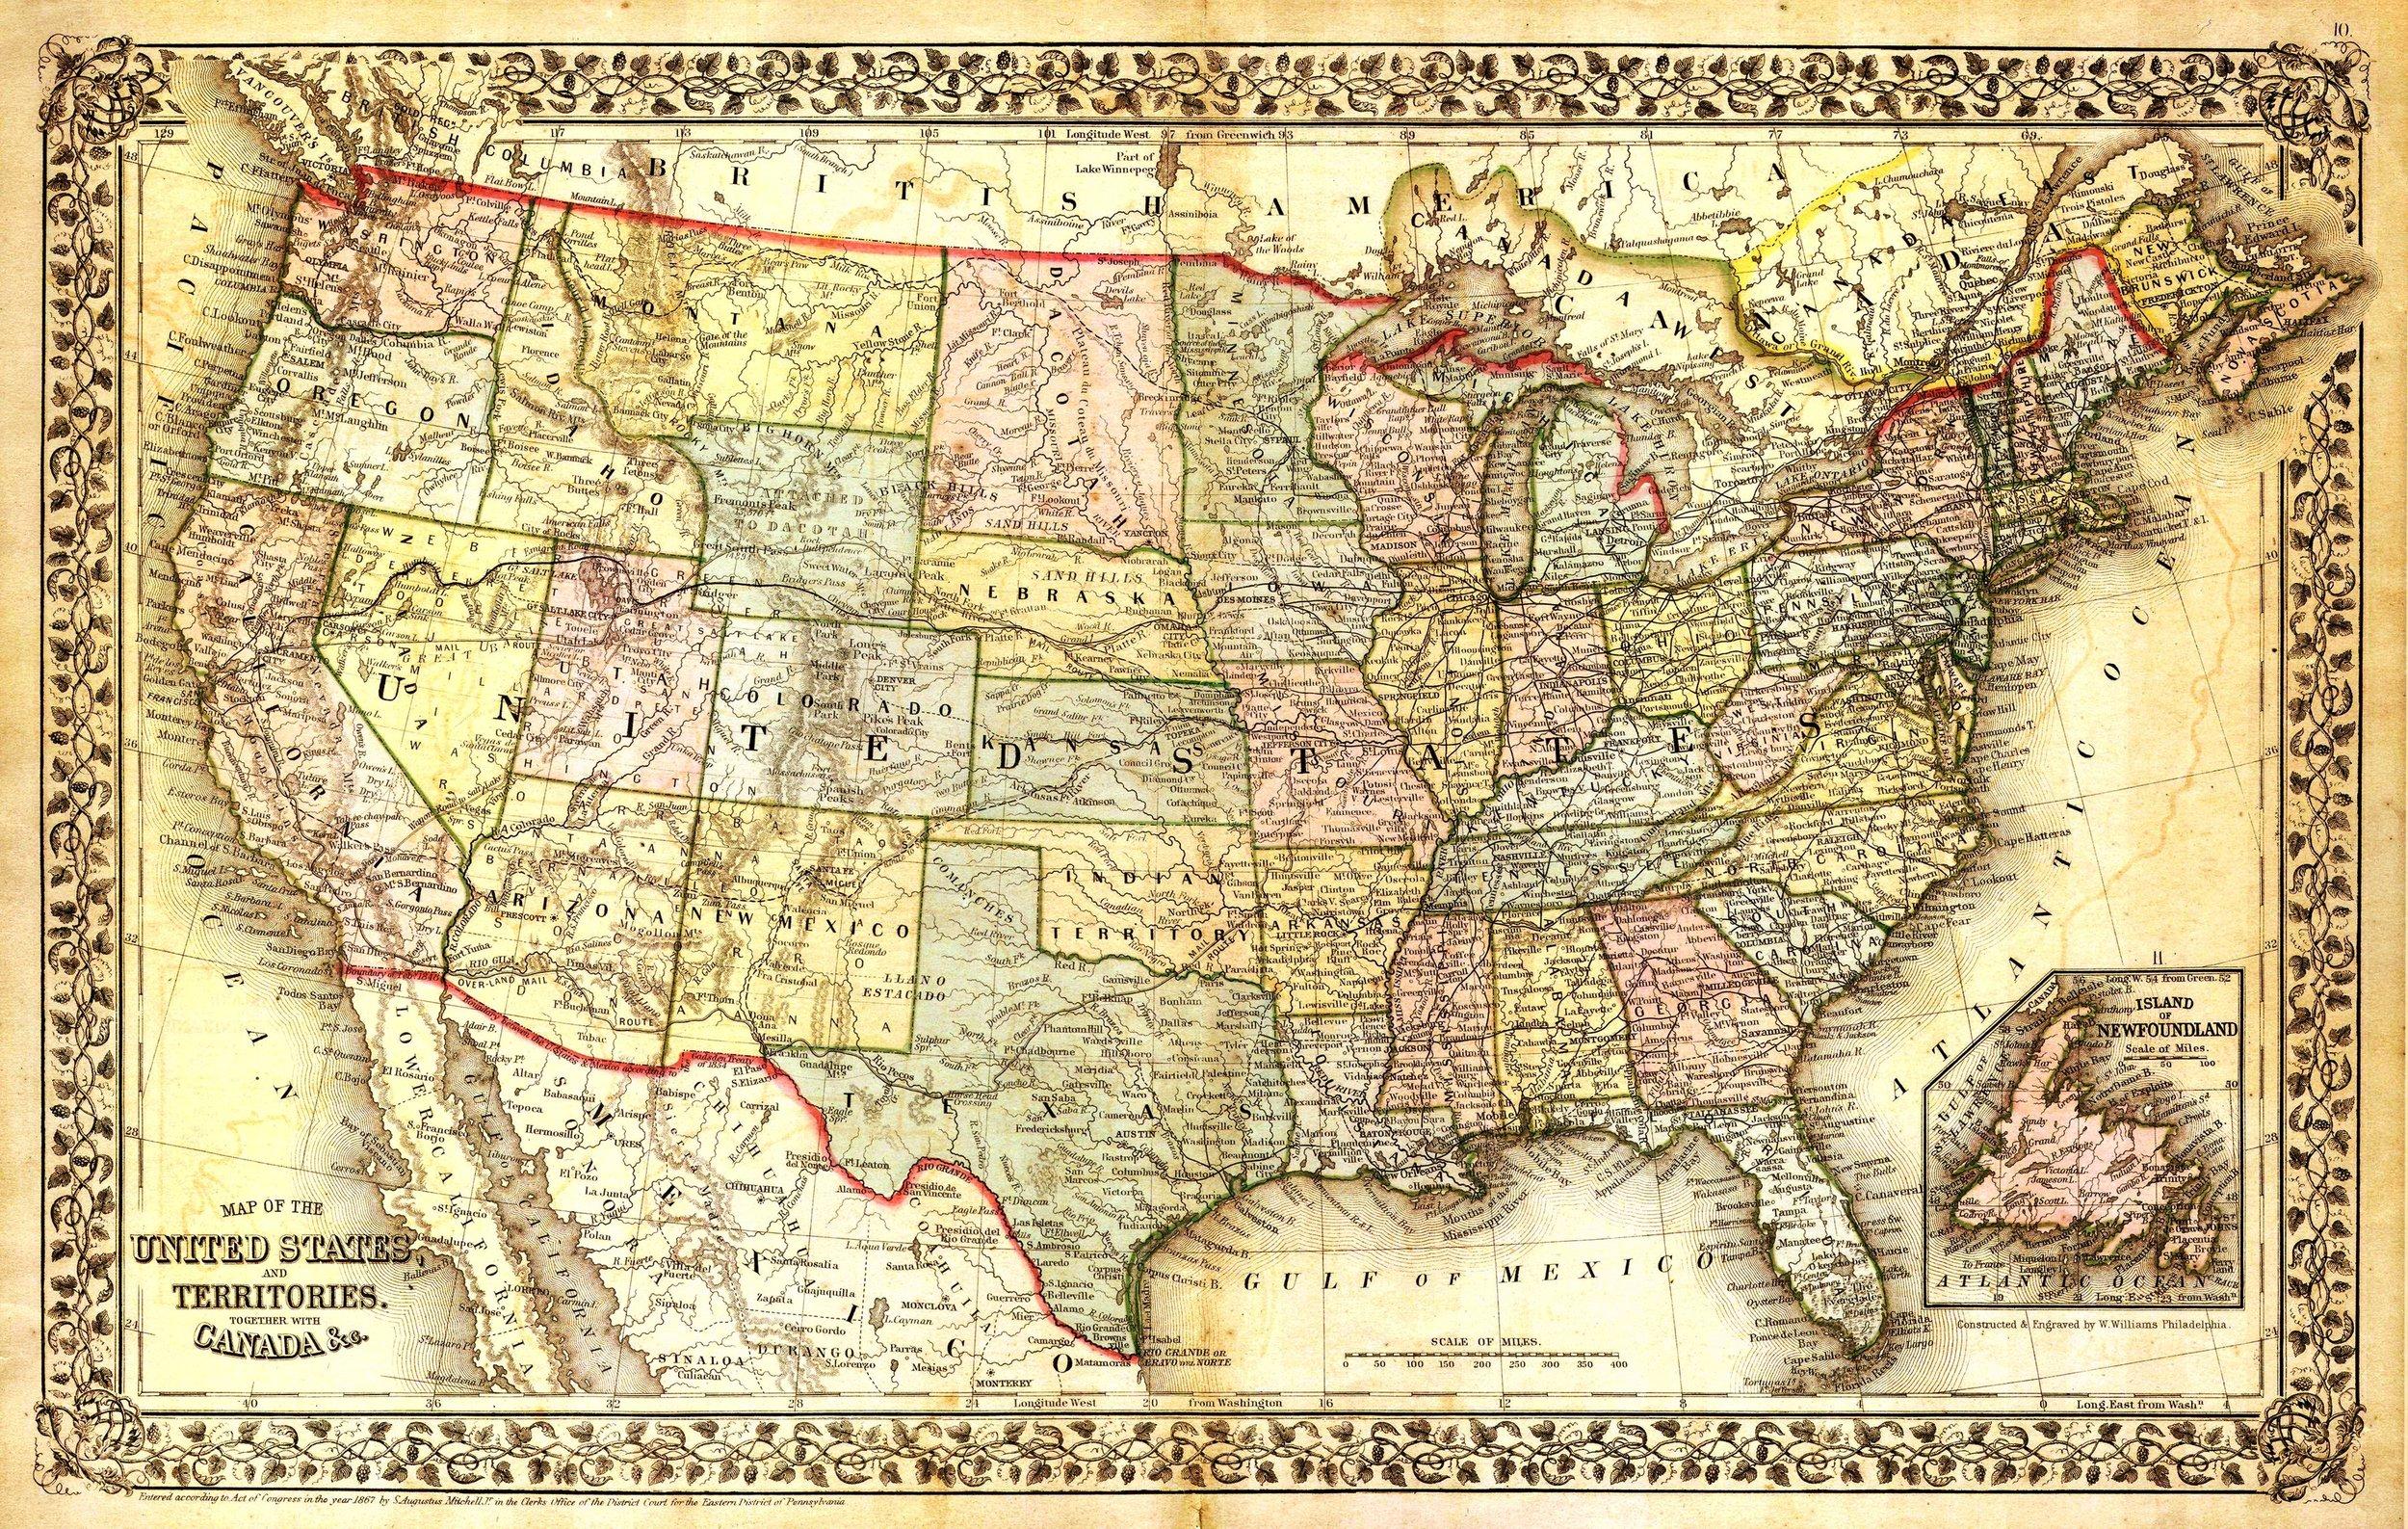 ancient-antique-antique-map-269646.jpg